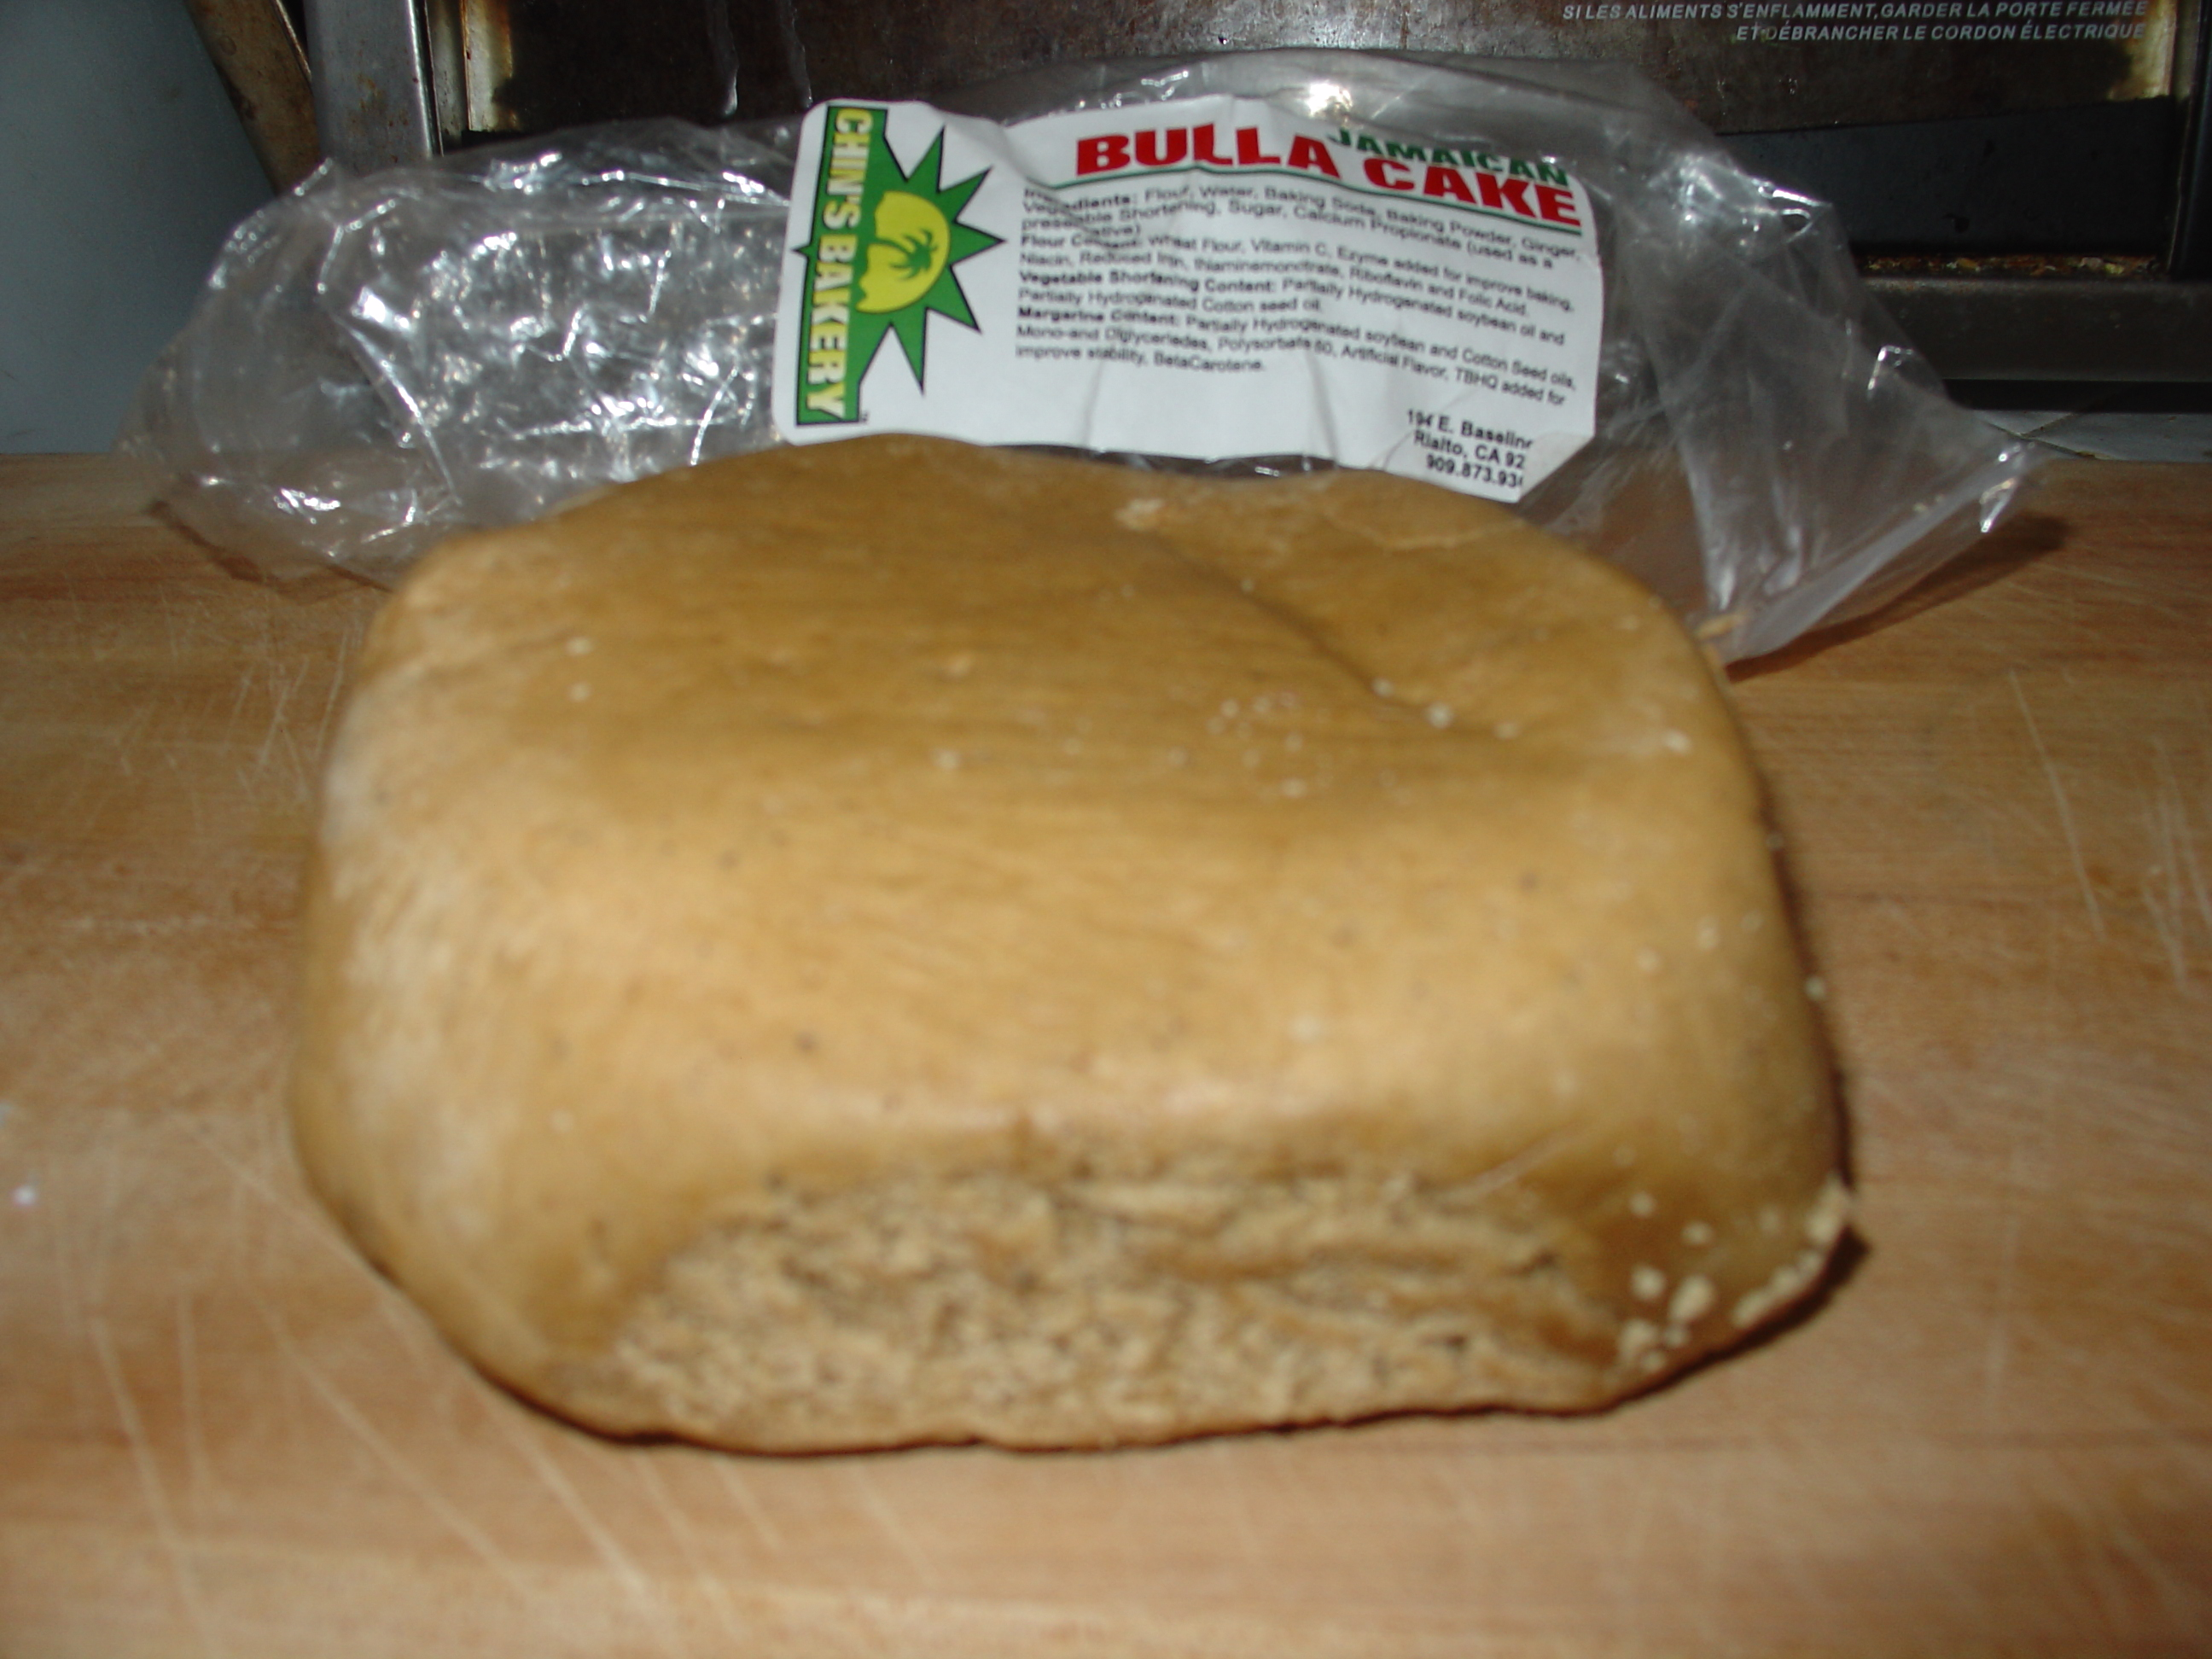 Bulla Cake Wikipedia